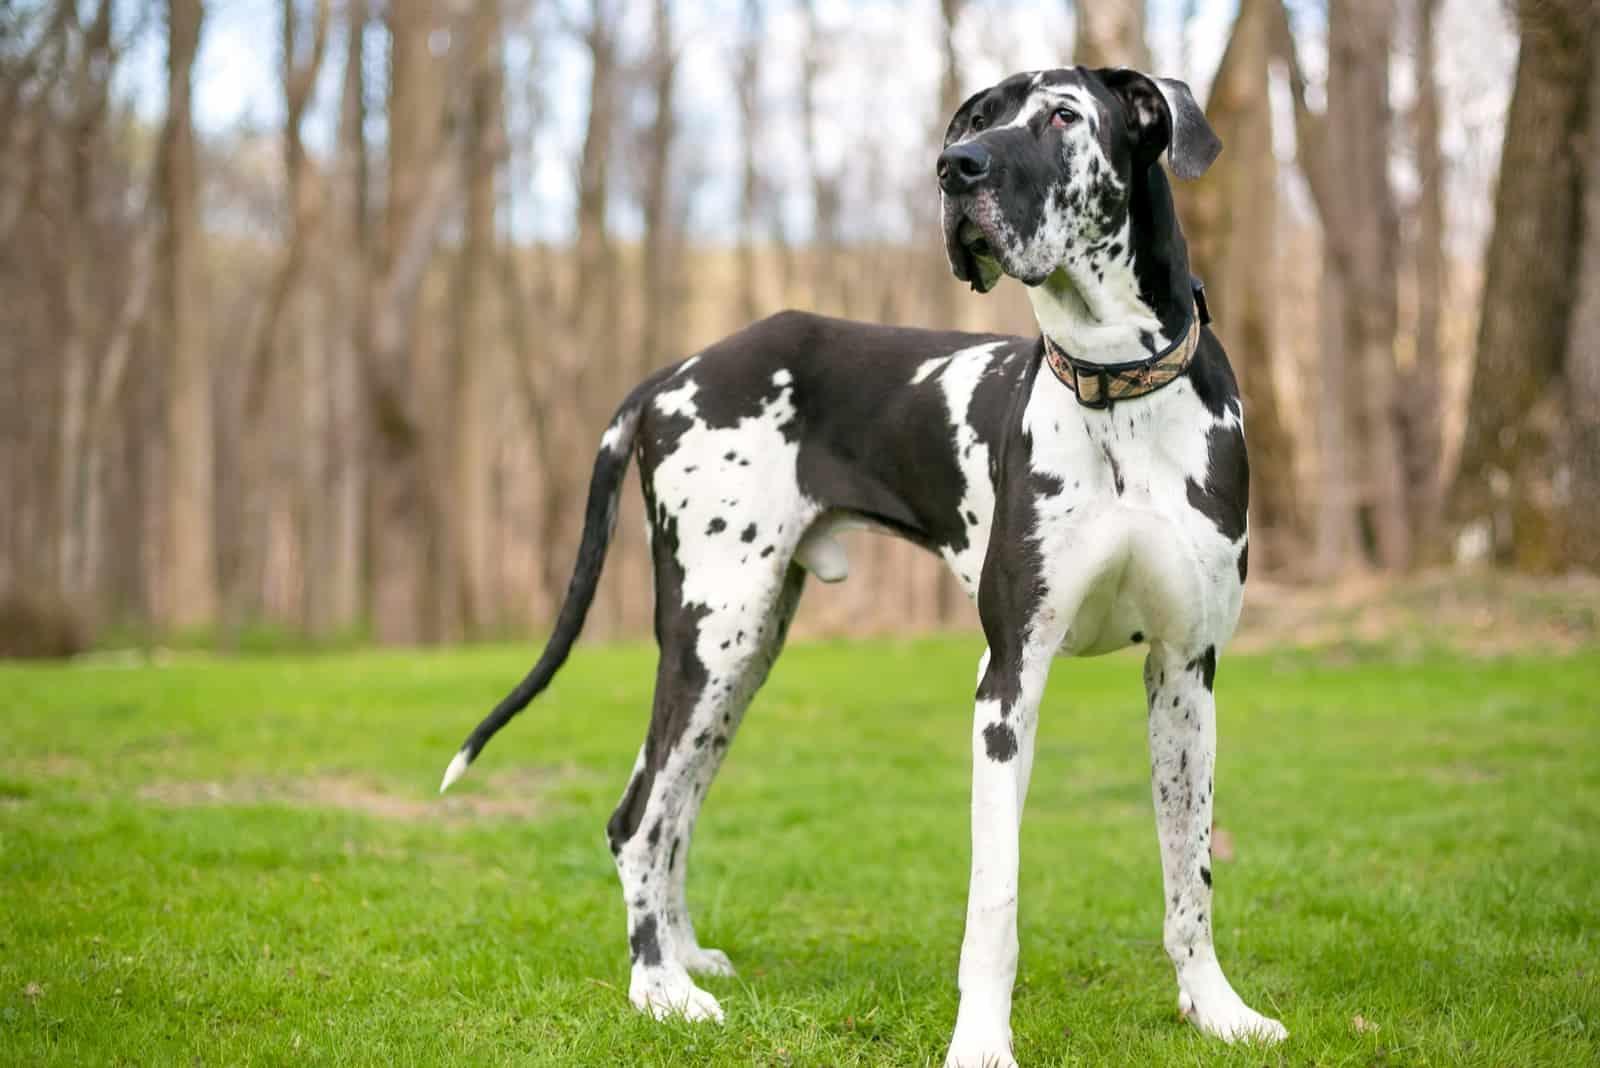 black and white purebred Harlequin Great Dane dog outdoors